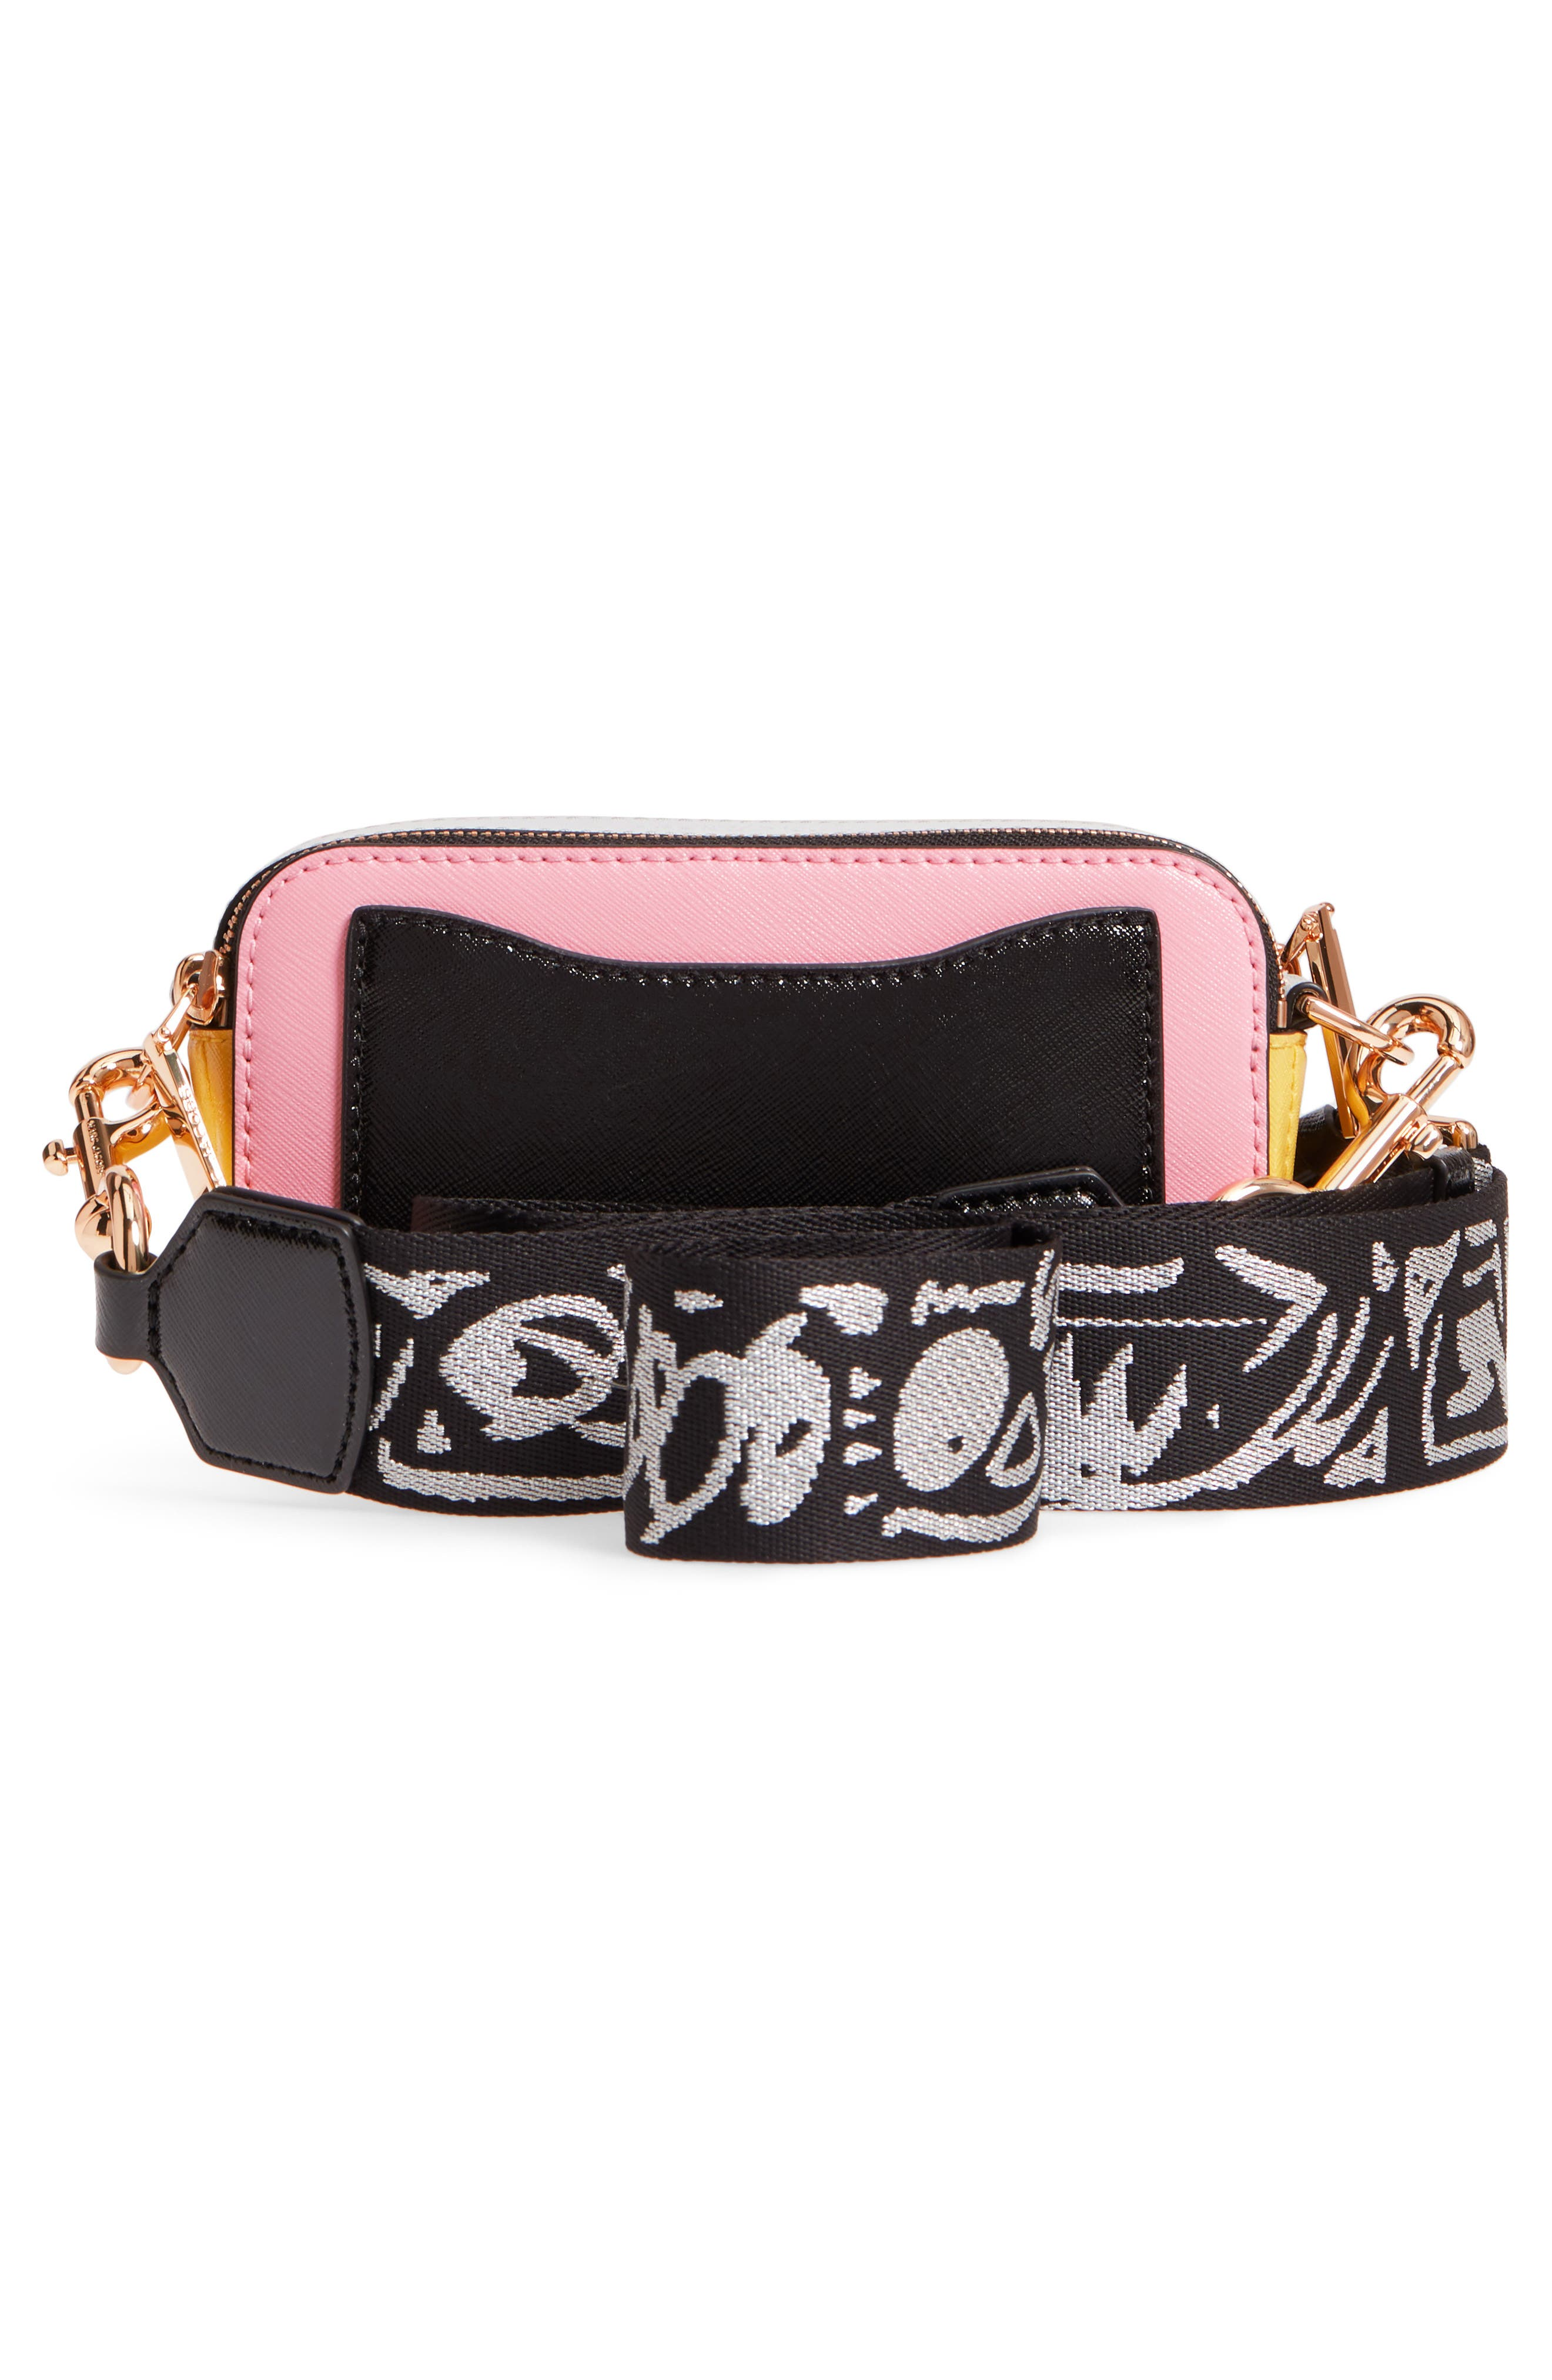 Snapshot Crossbody Bag,                             Alternate thumbnail 3, color,                             Baby Pink Multi